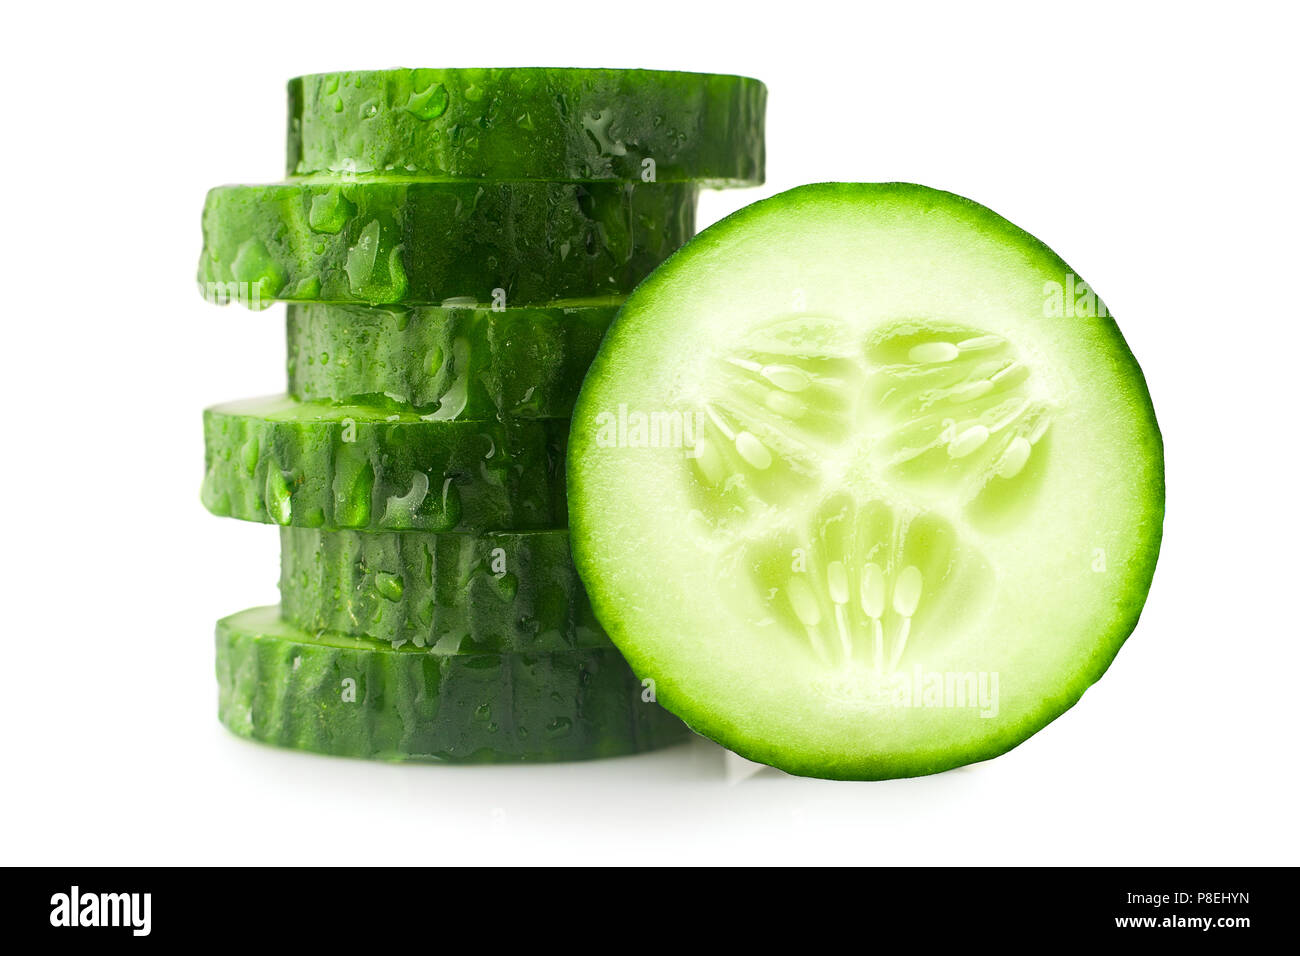 fresh juicy slice cucumber on a white background, isolated - Stock Image